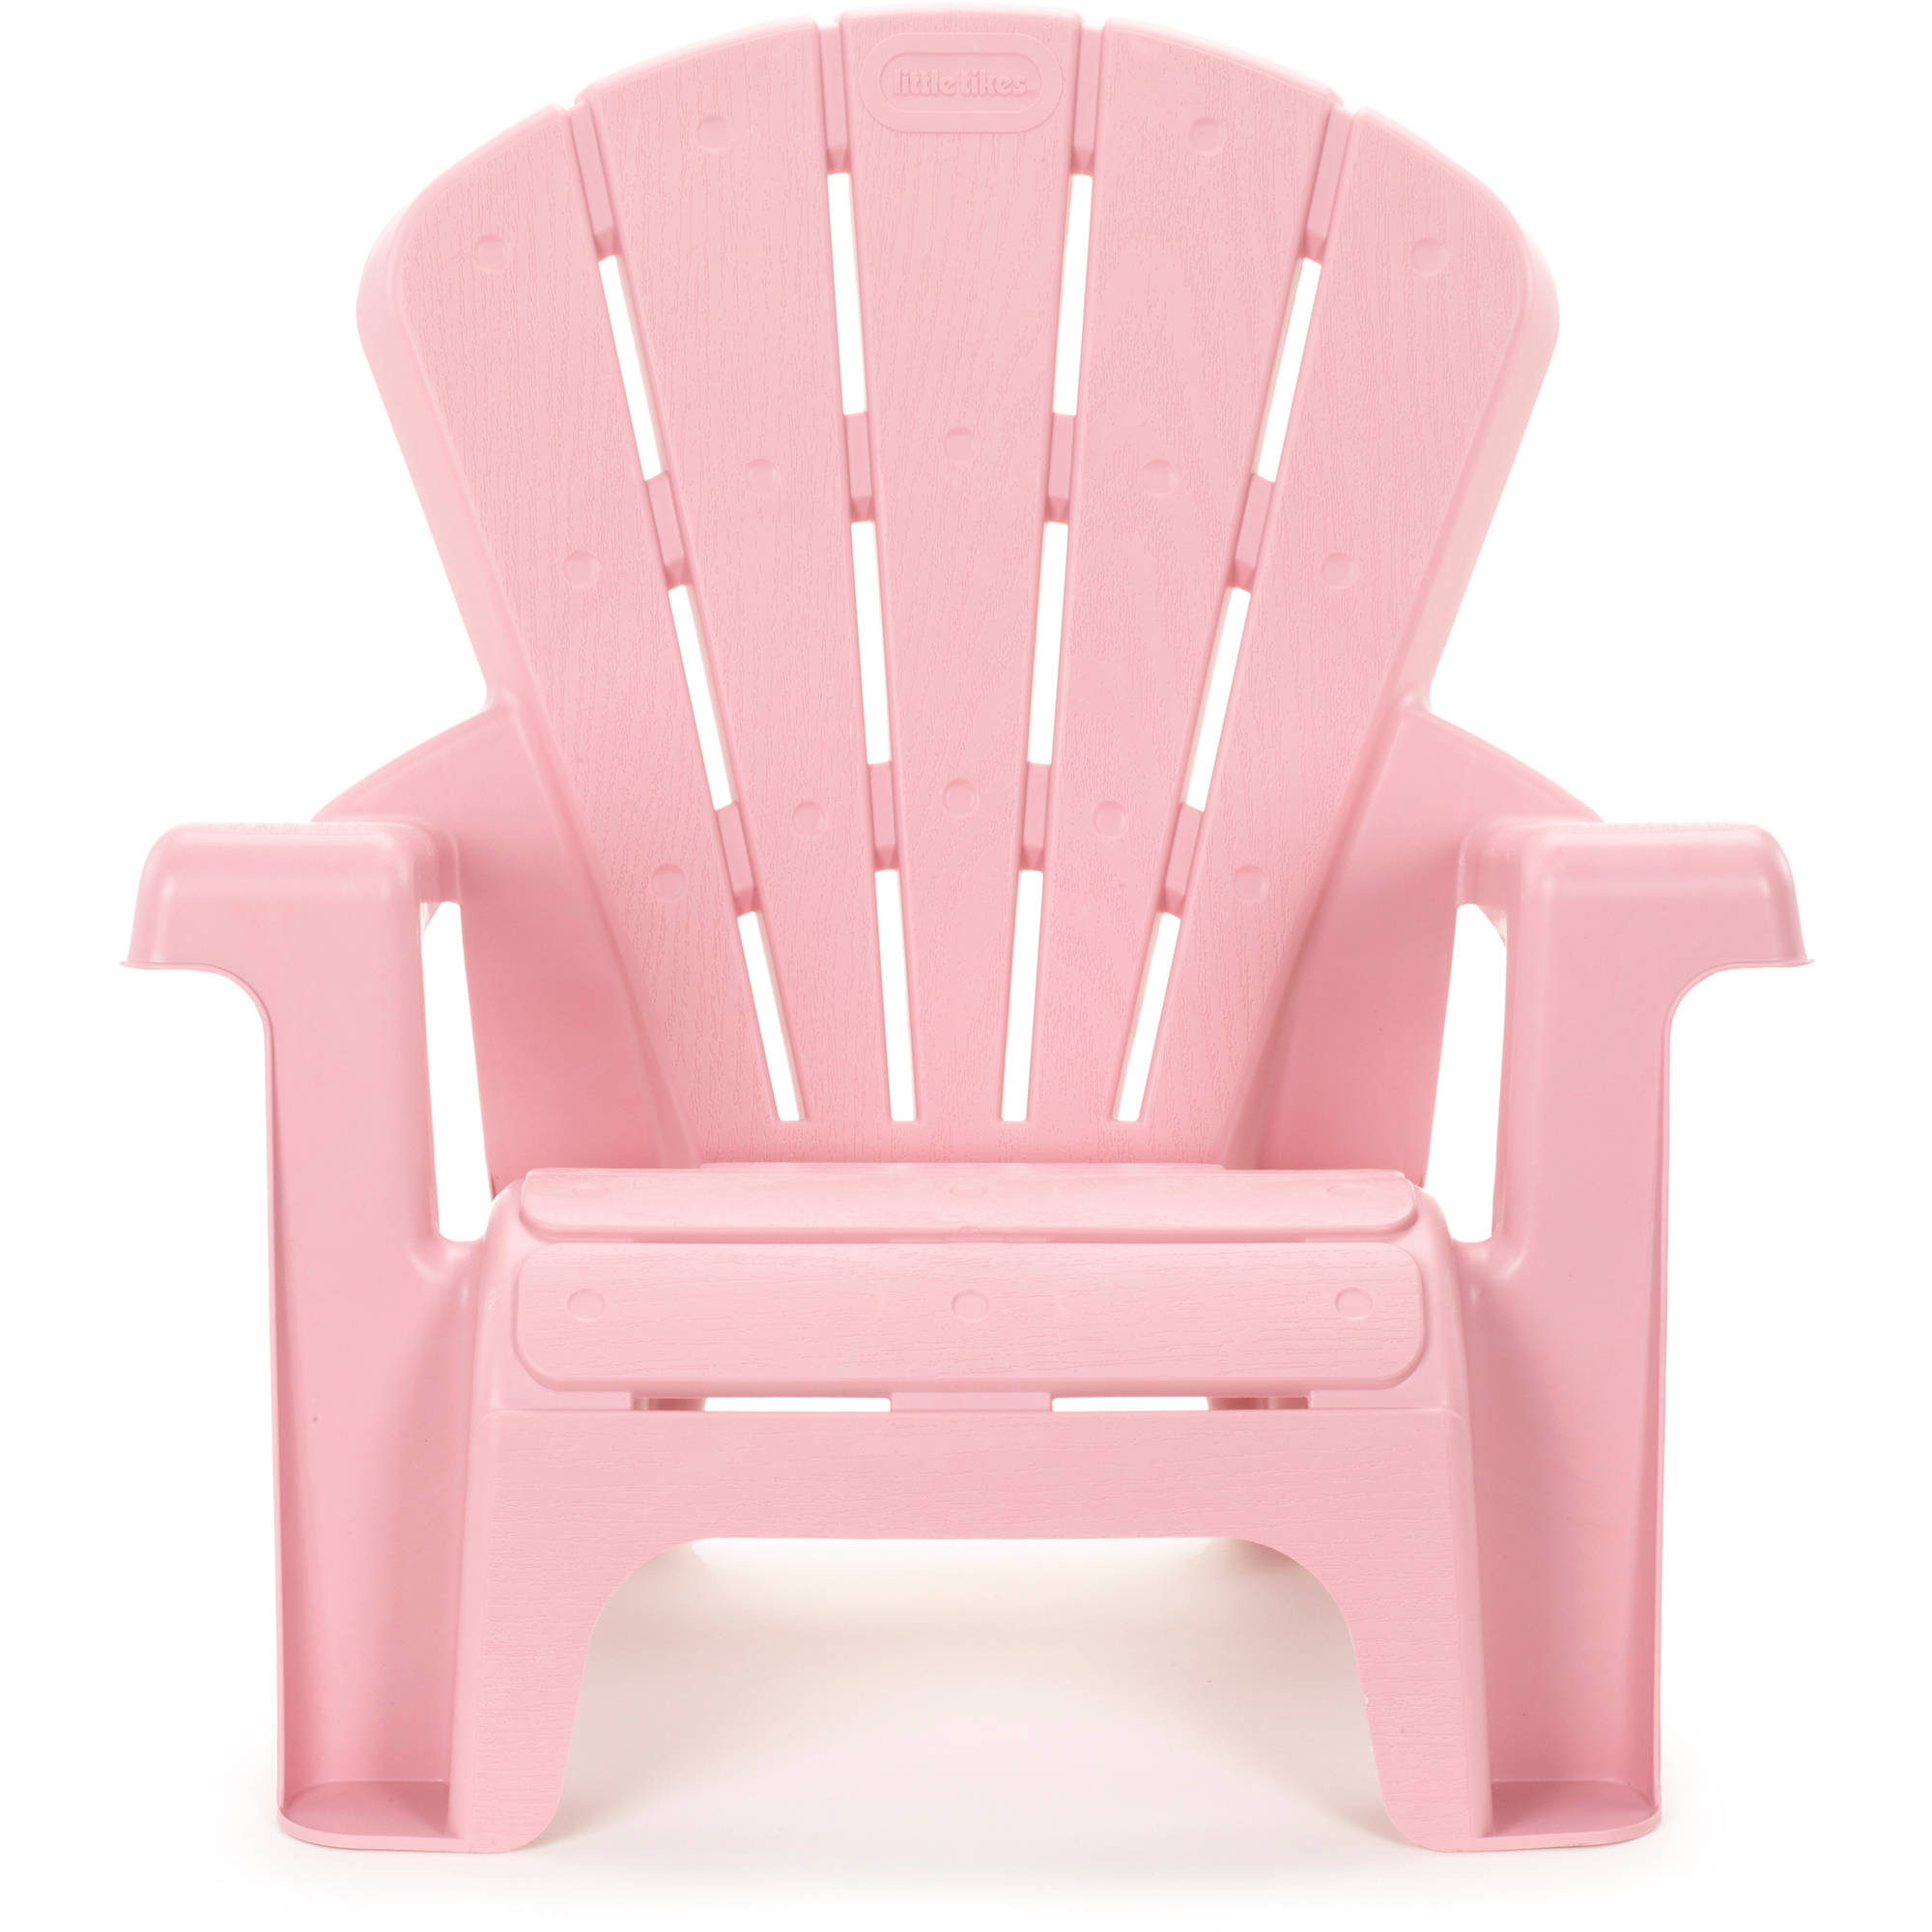 Little Tikes Garden Chair, Pink